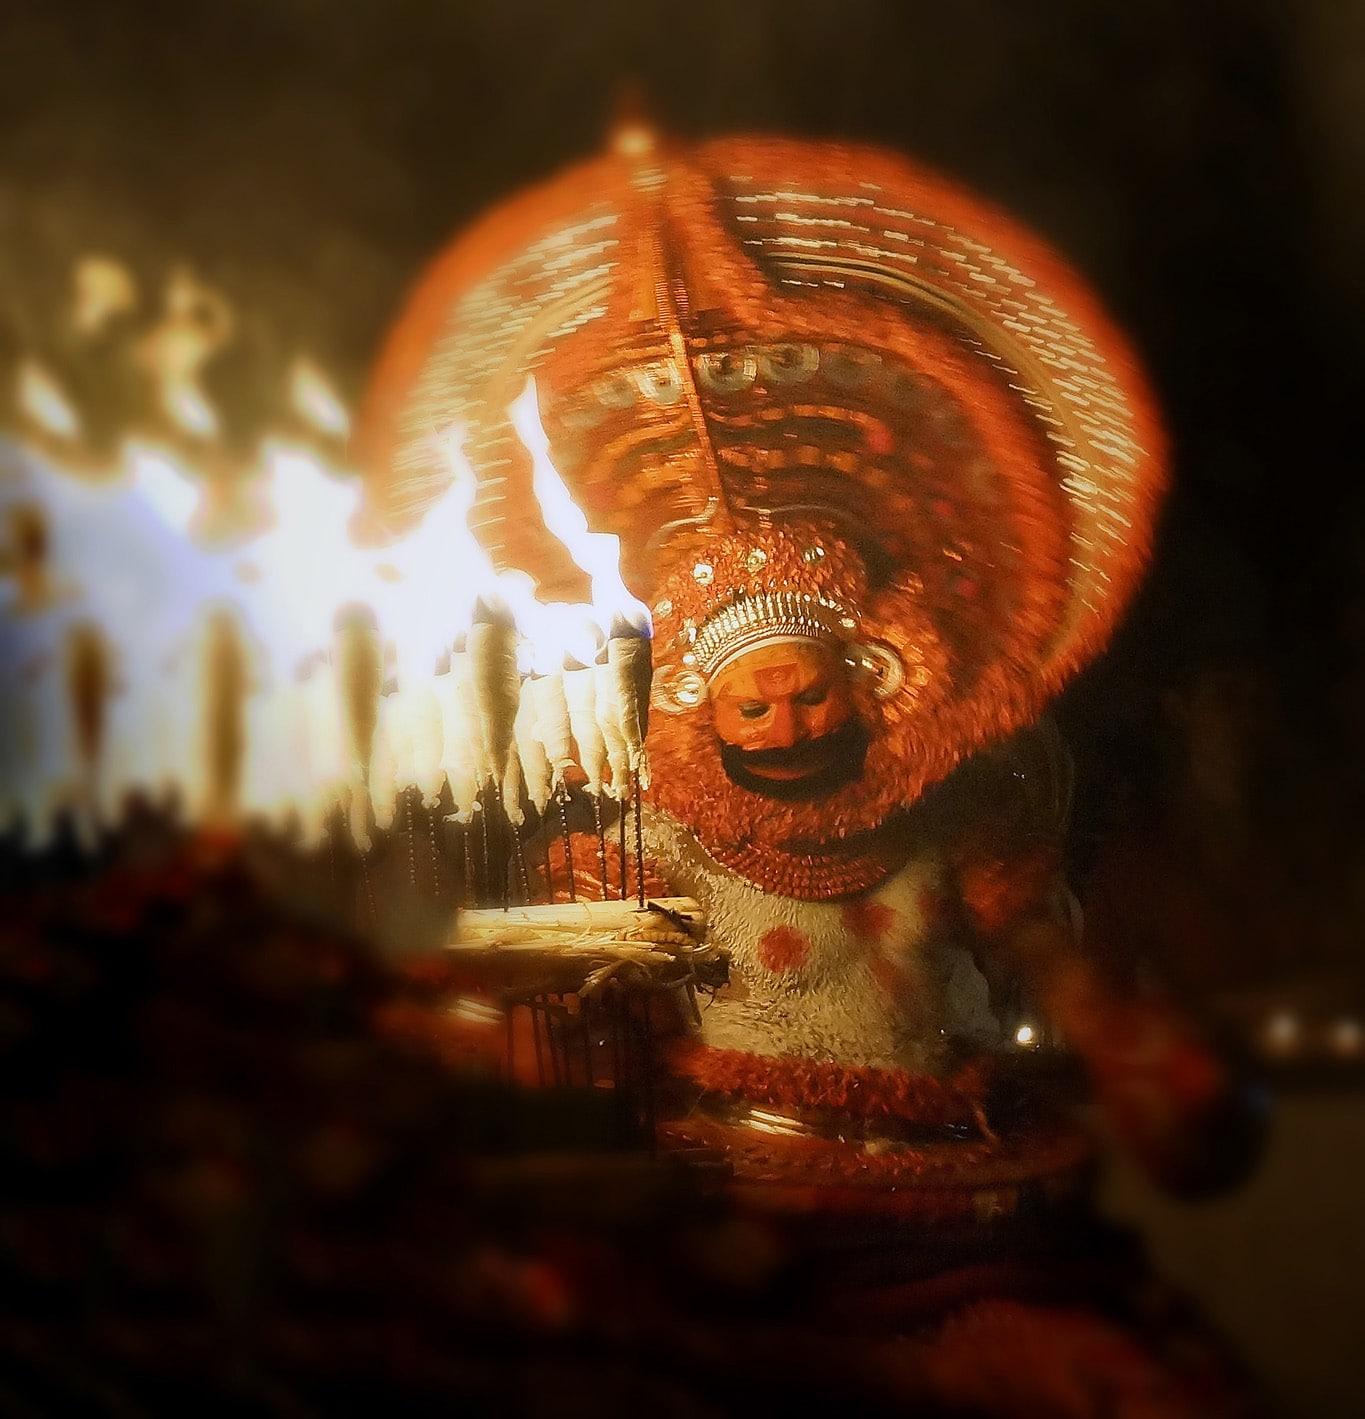 Gros plan sur Kathivanoor veeran rituel du theyyam - Kannur - Malabar